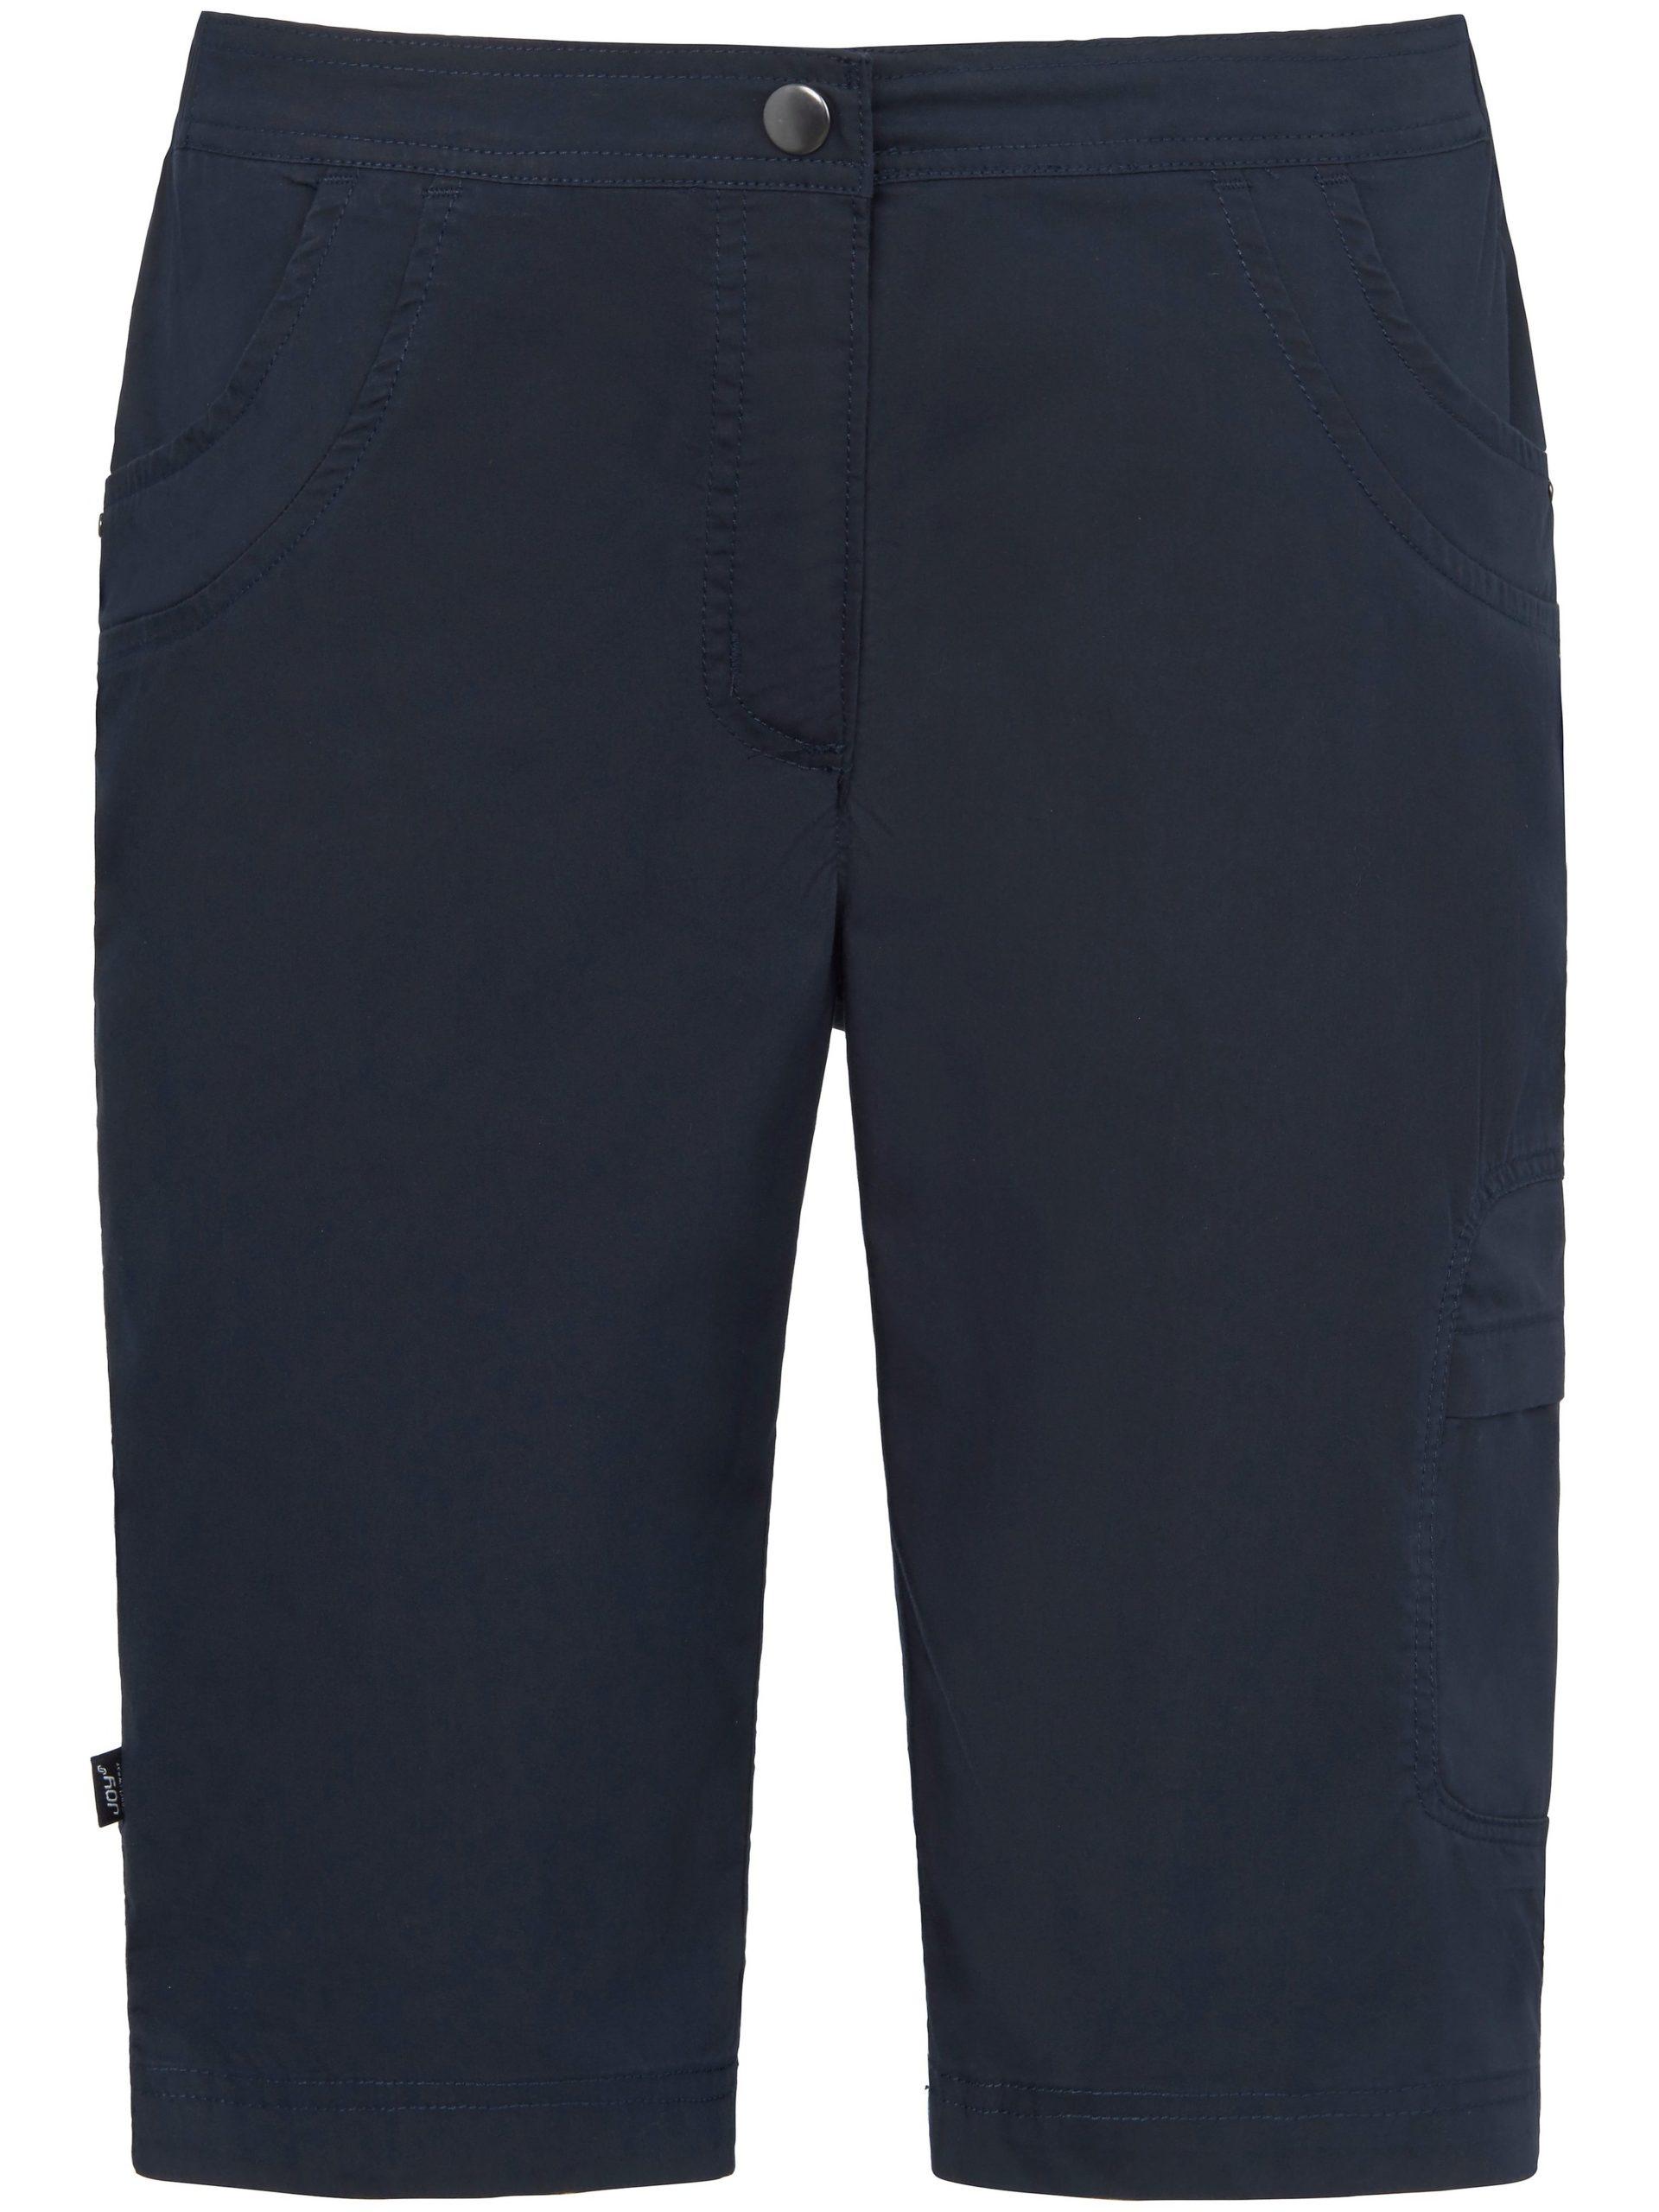 Bermuda Lana Van JOY Sportswear blauw Kopen